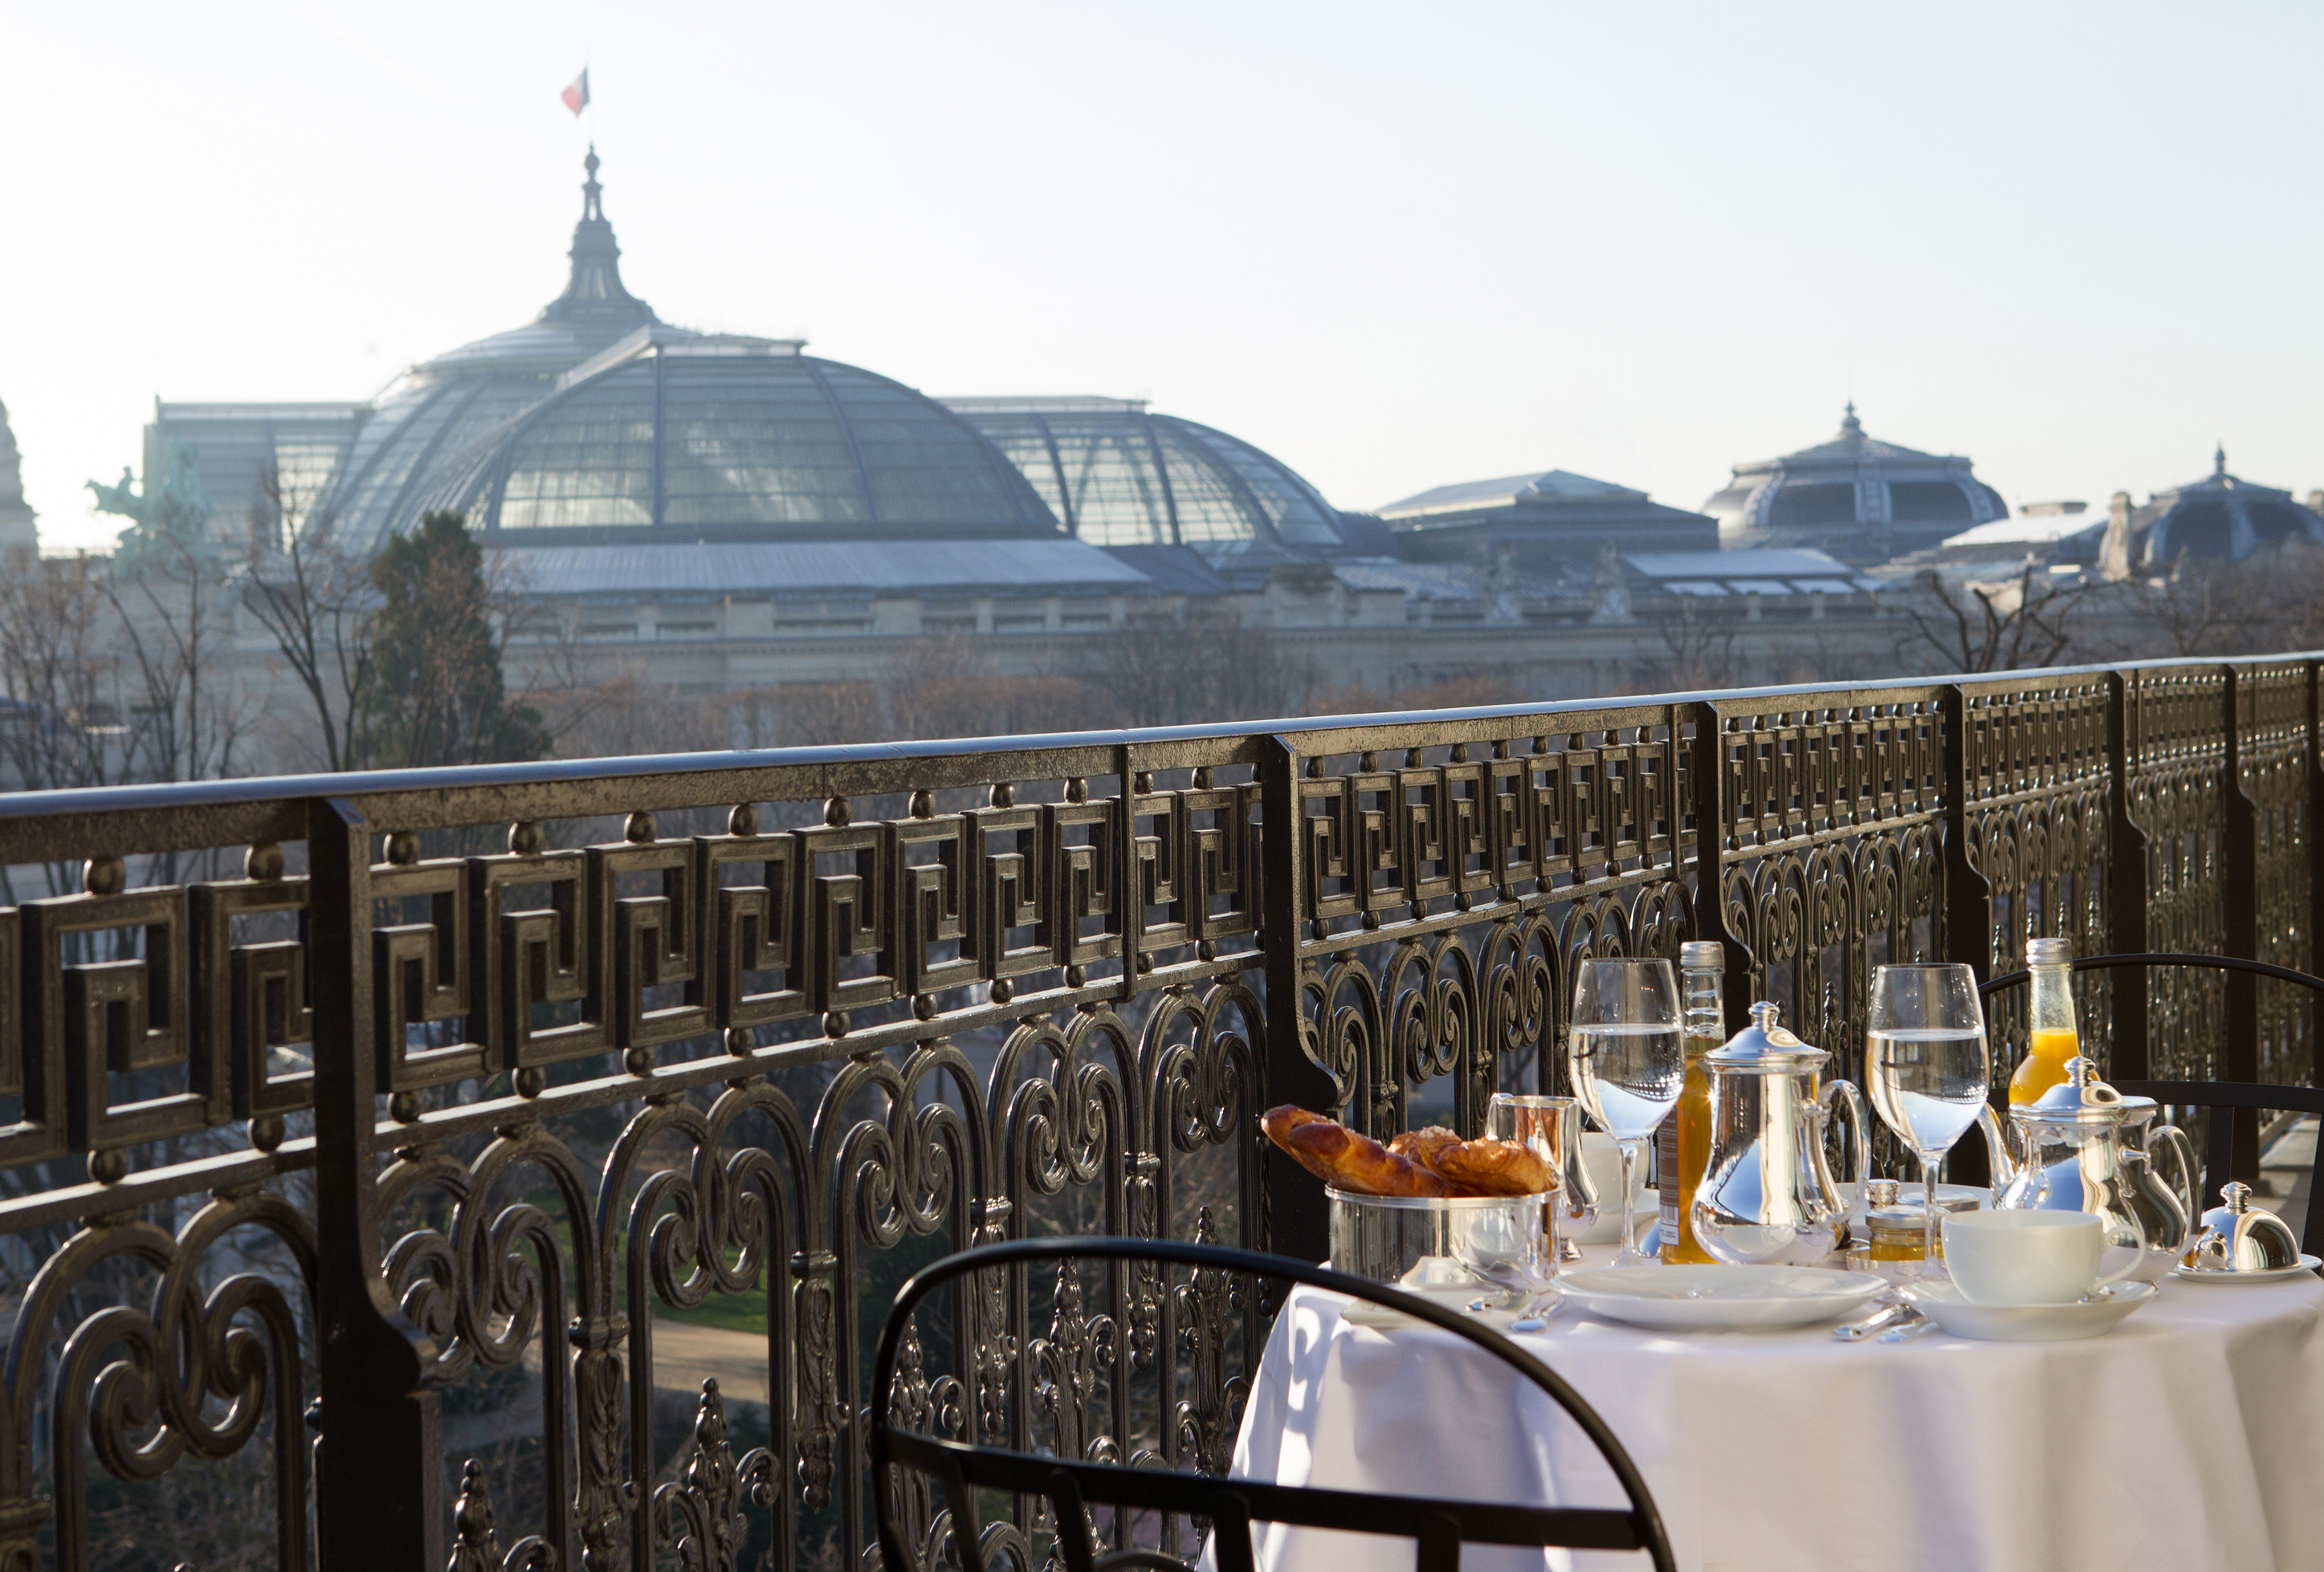 Hotel La Reserve Paris